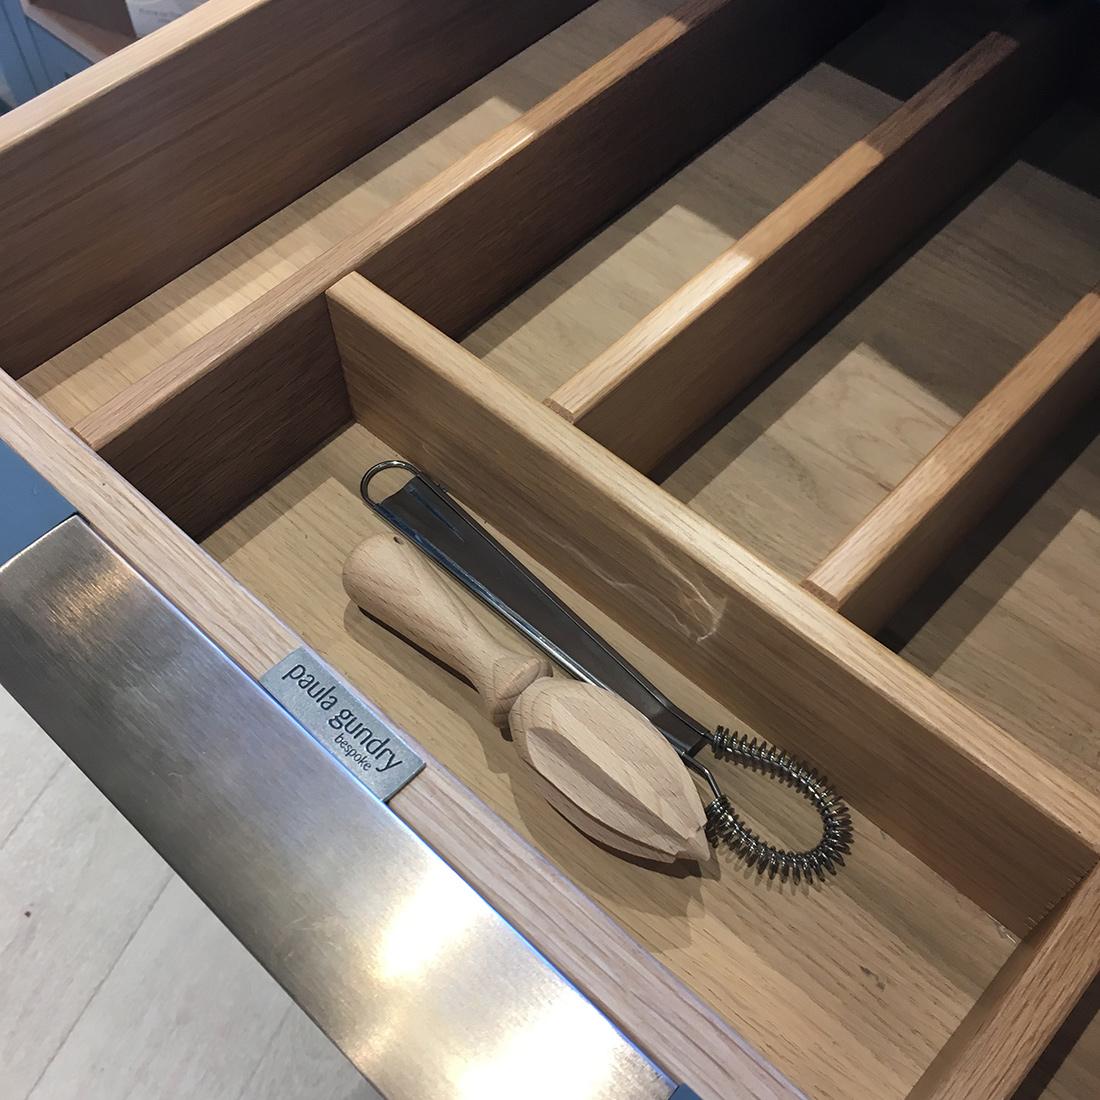 Bespoke Cabinetry Norfolk